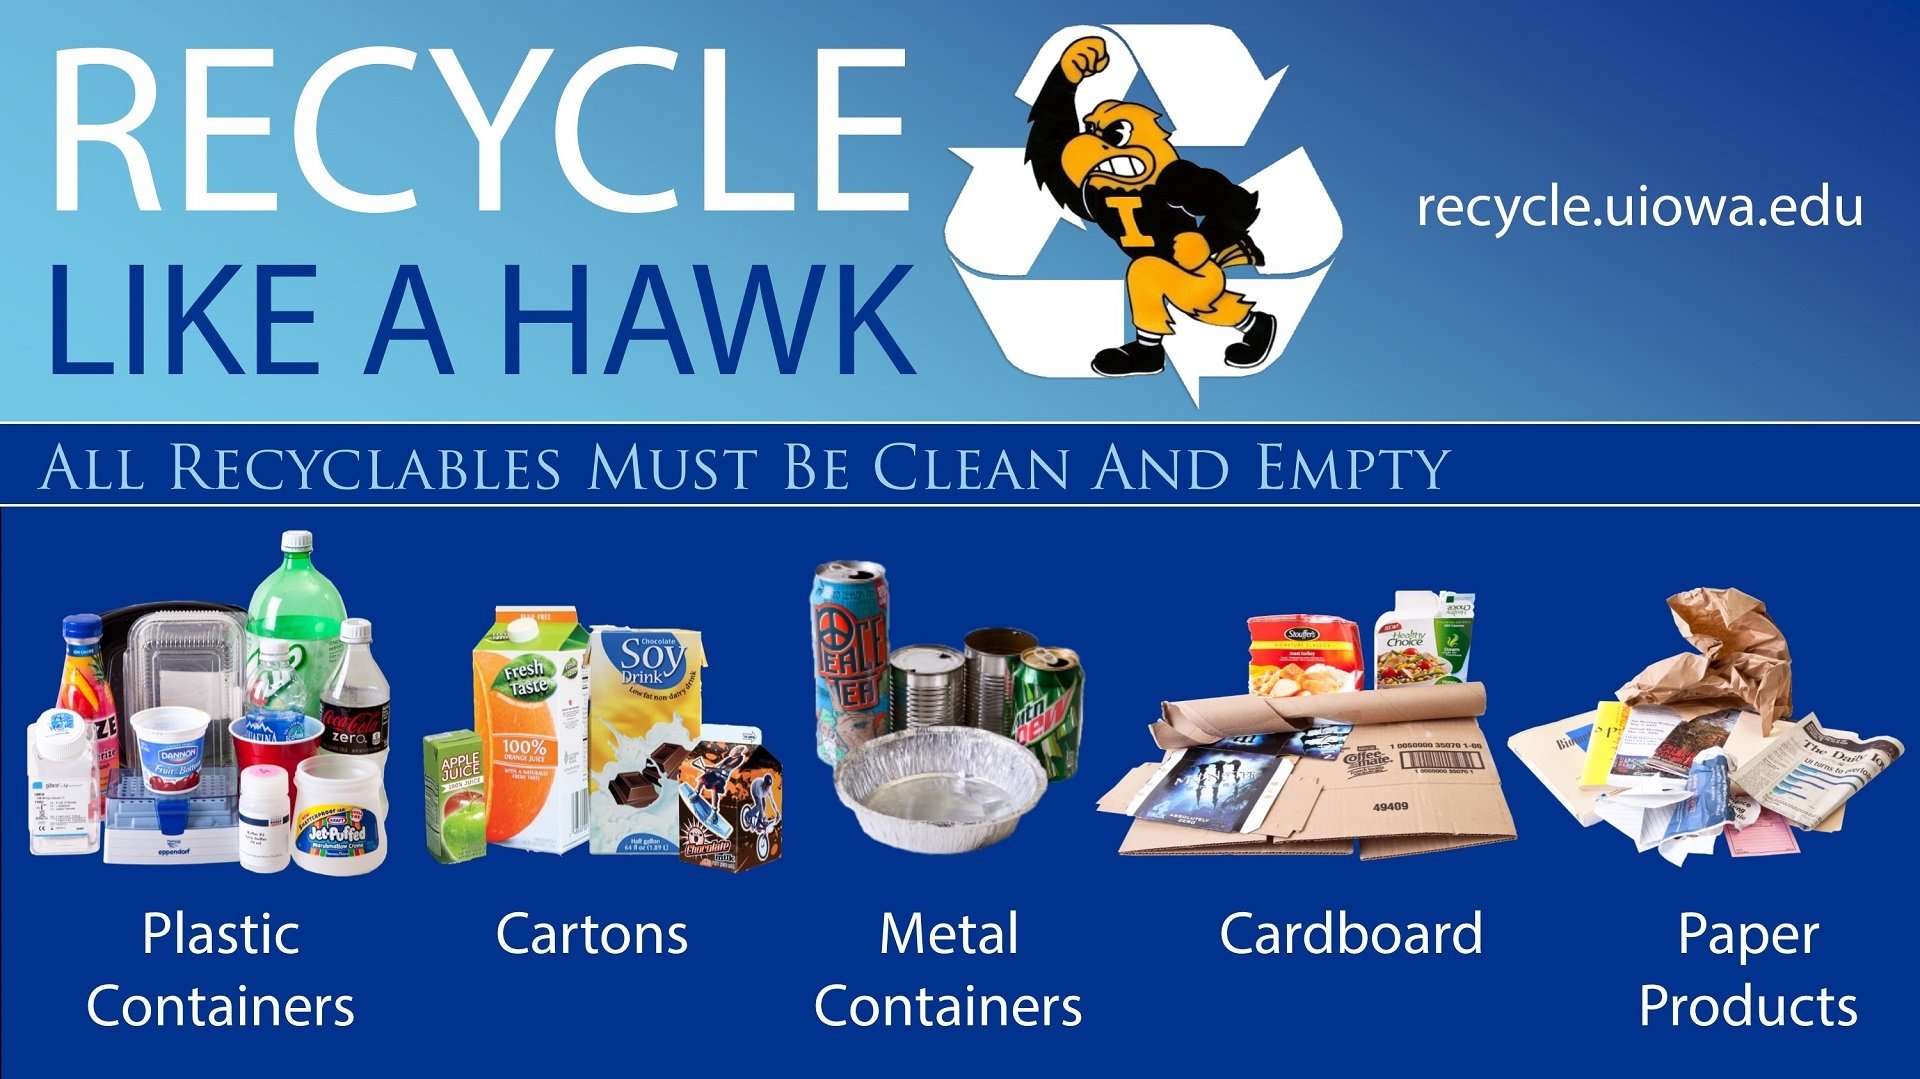 Recycle Like a Hawk